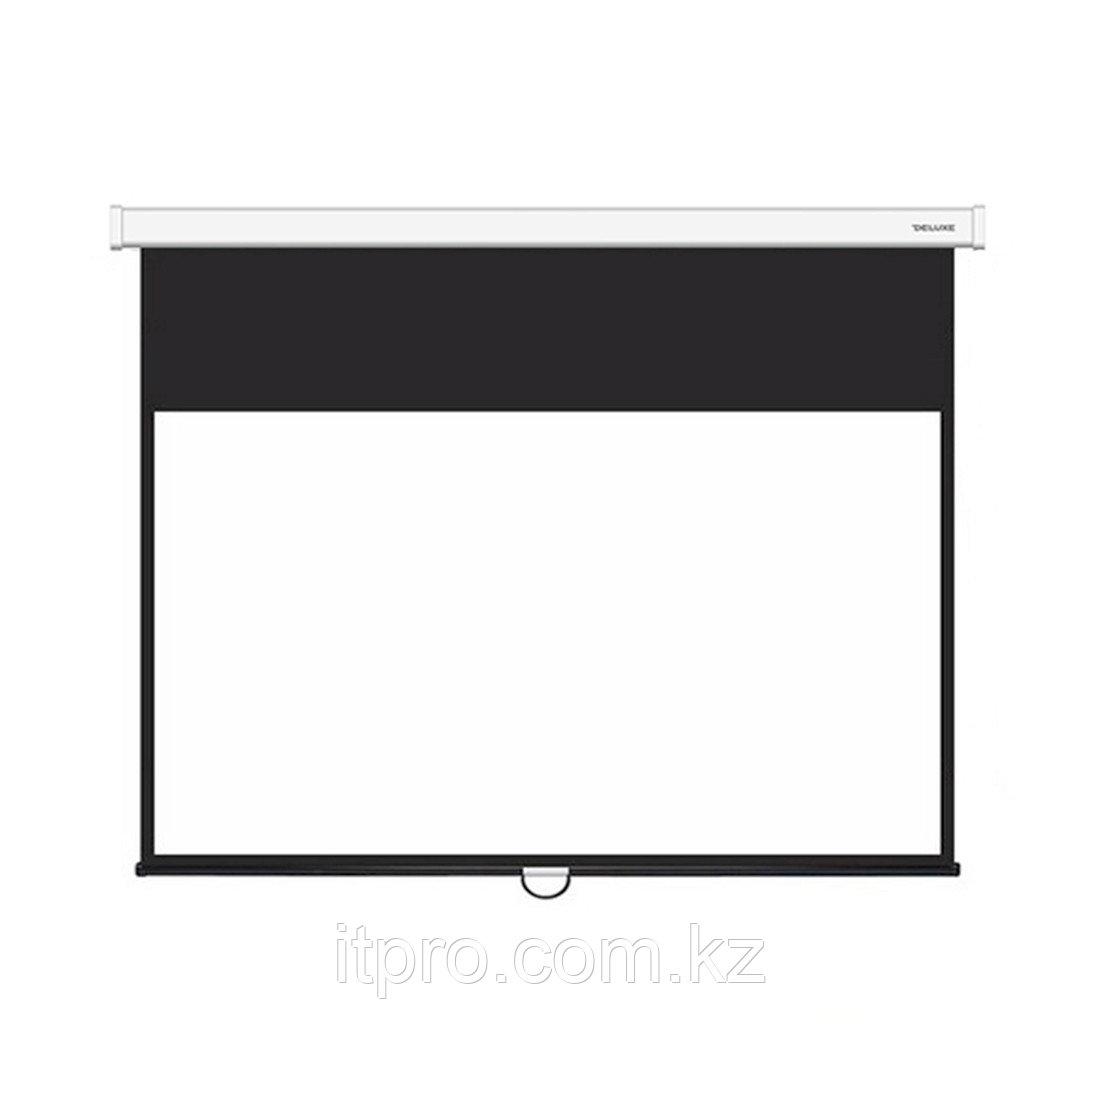 Экран настенный Deluxe DLS-M265x149W